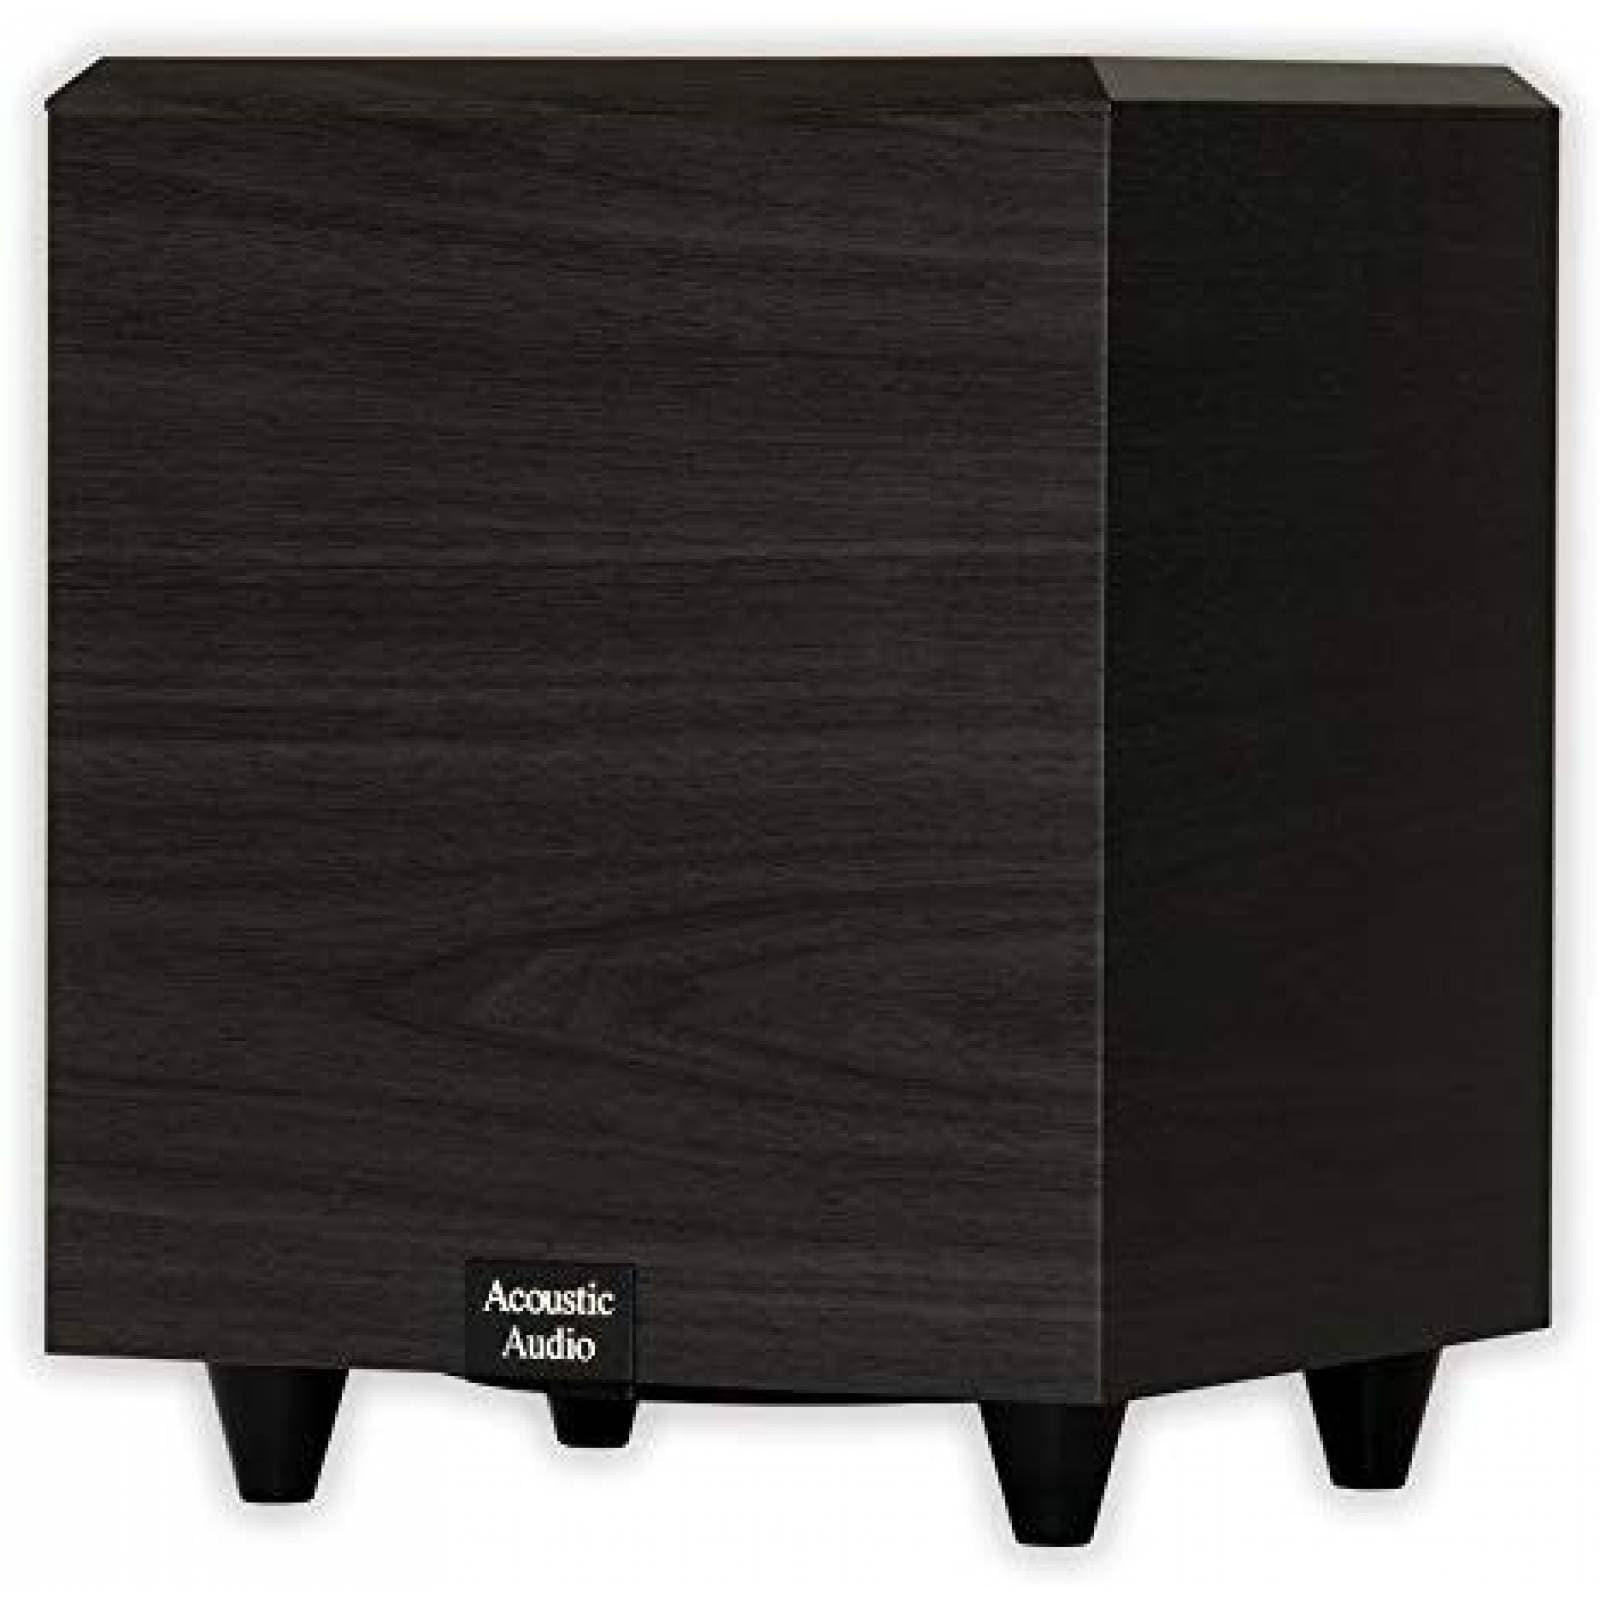 Bocina Acoustic Audio PSW-6 Subwoofer 6.5'' 250W -Negro